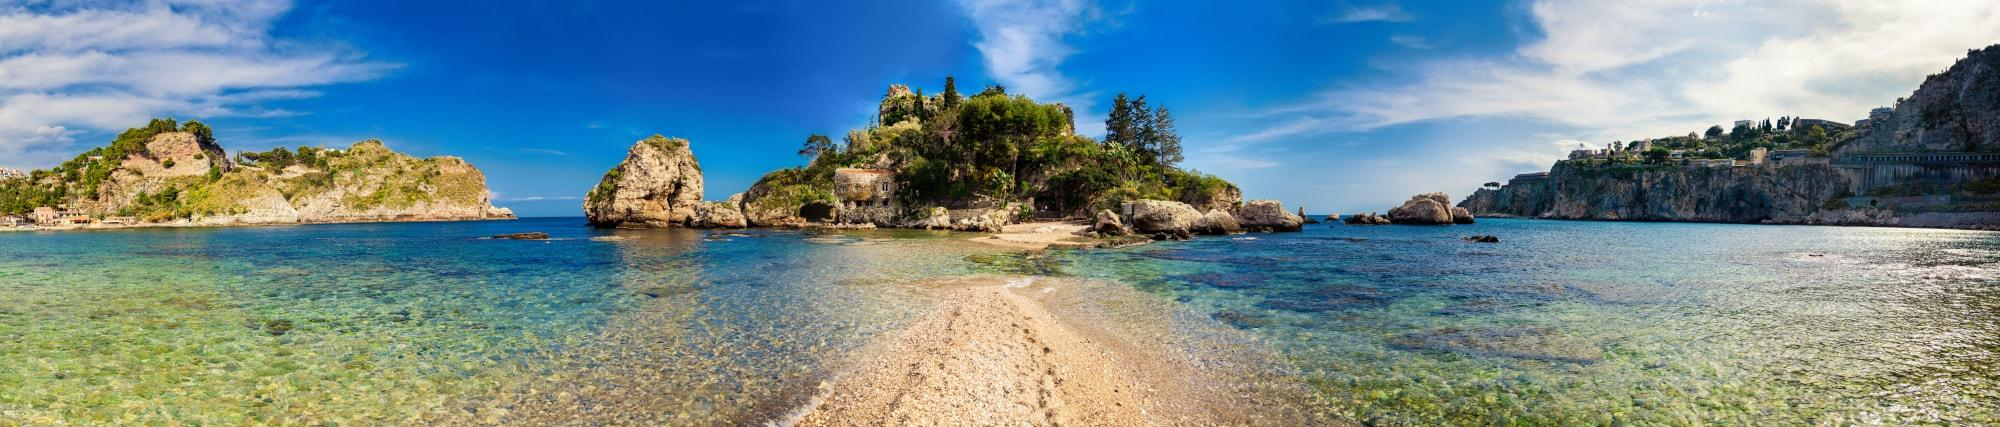 Panorama Isola Bella Taormina